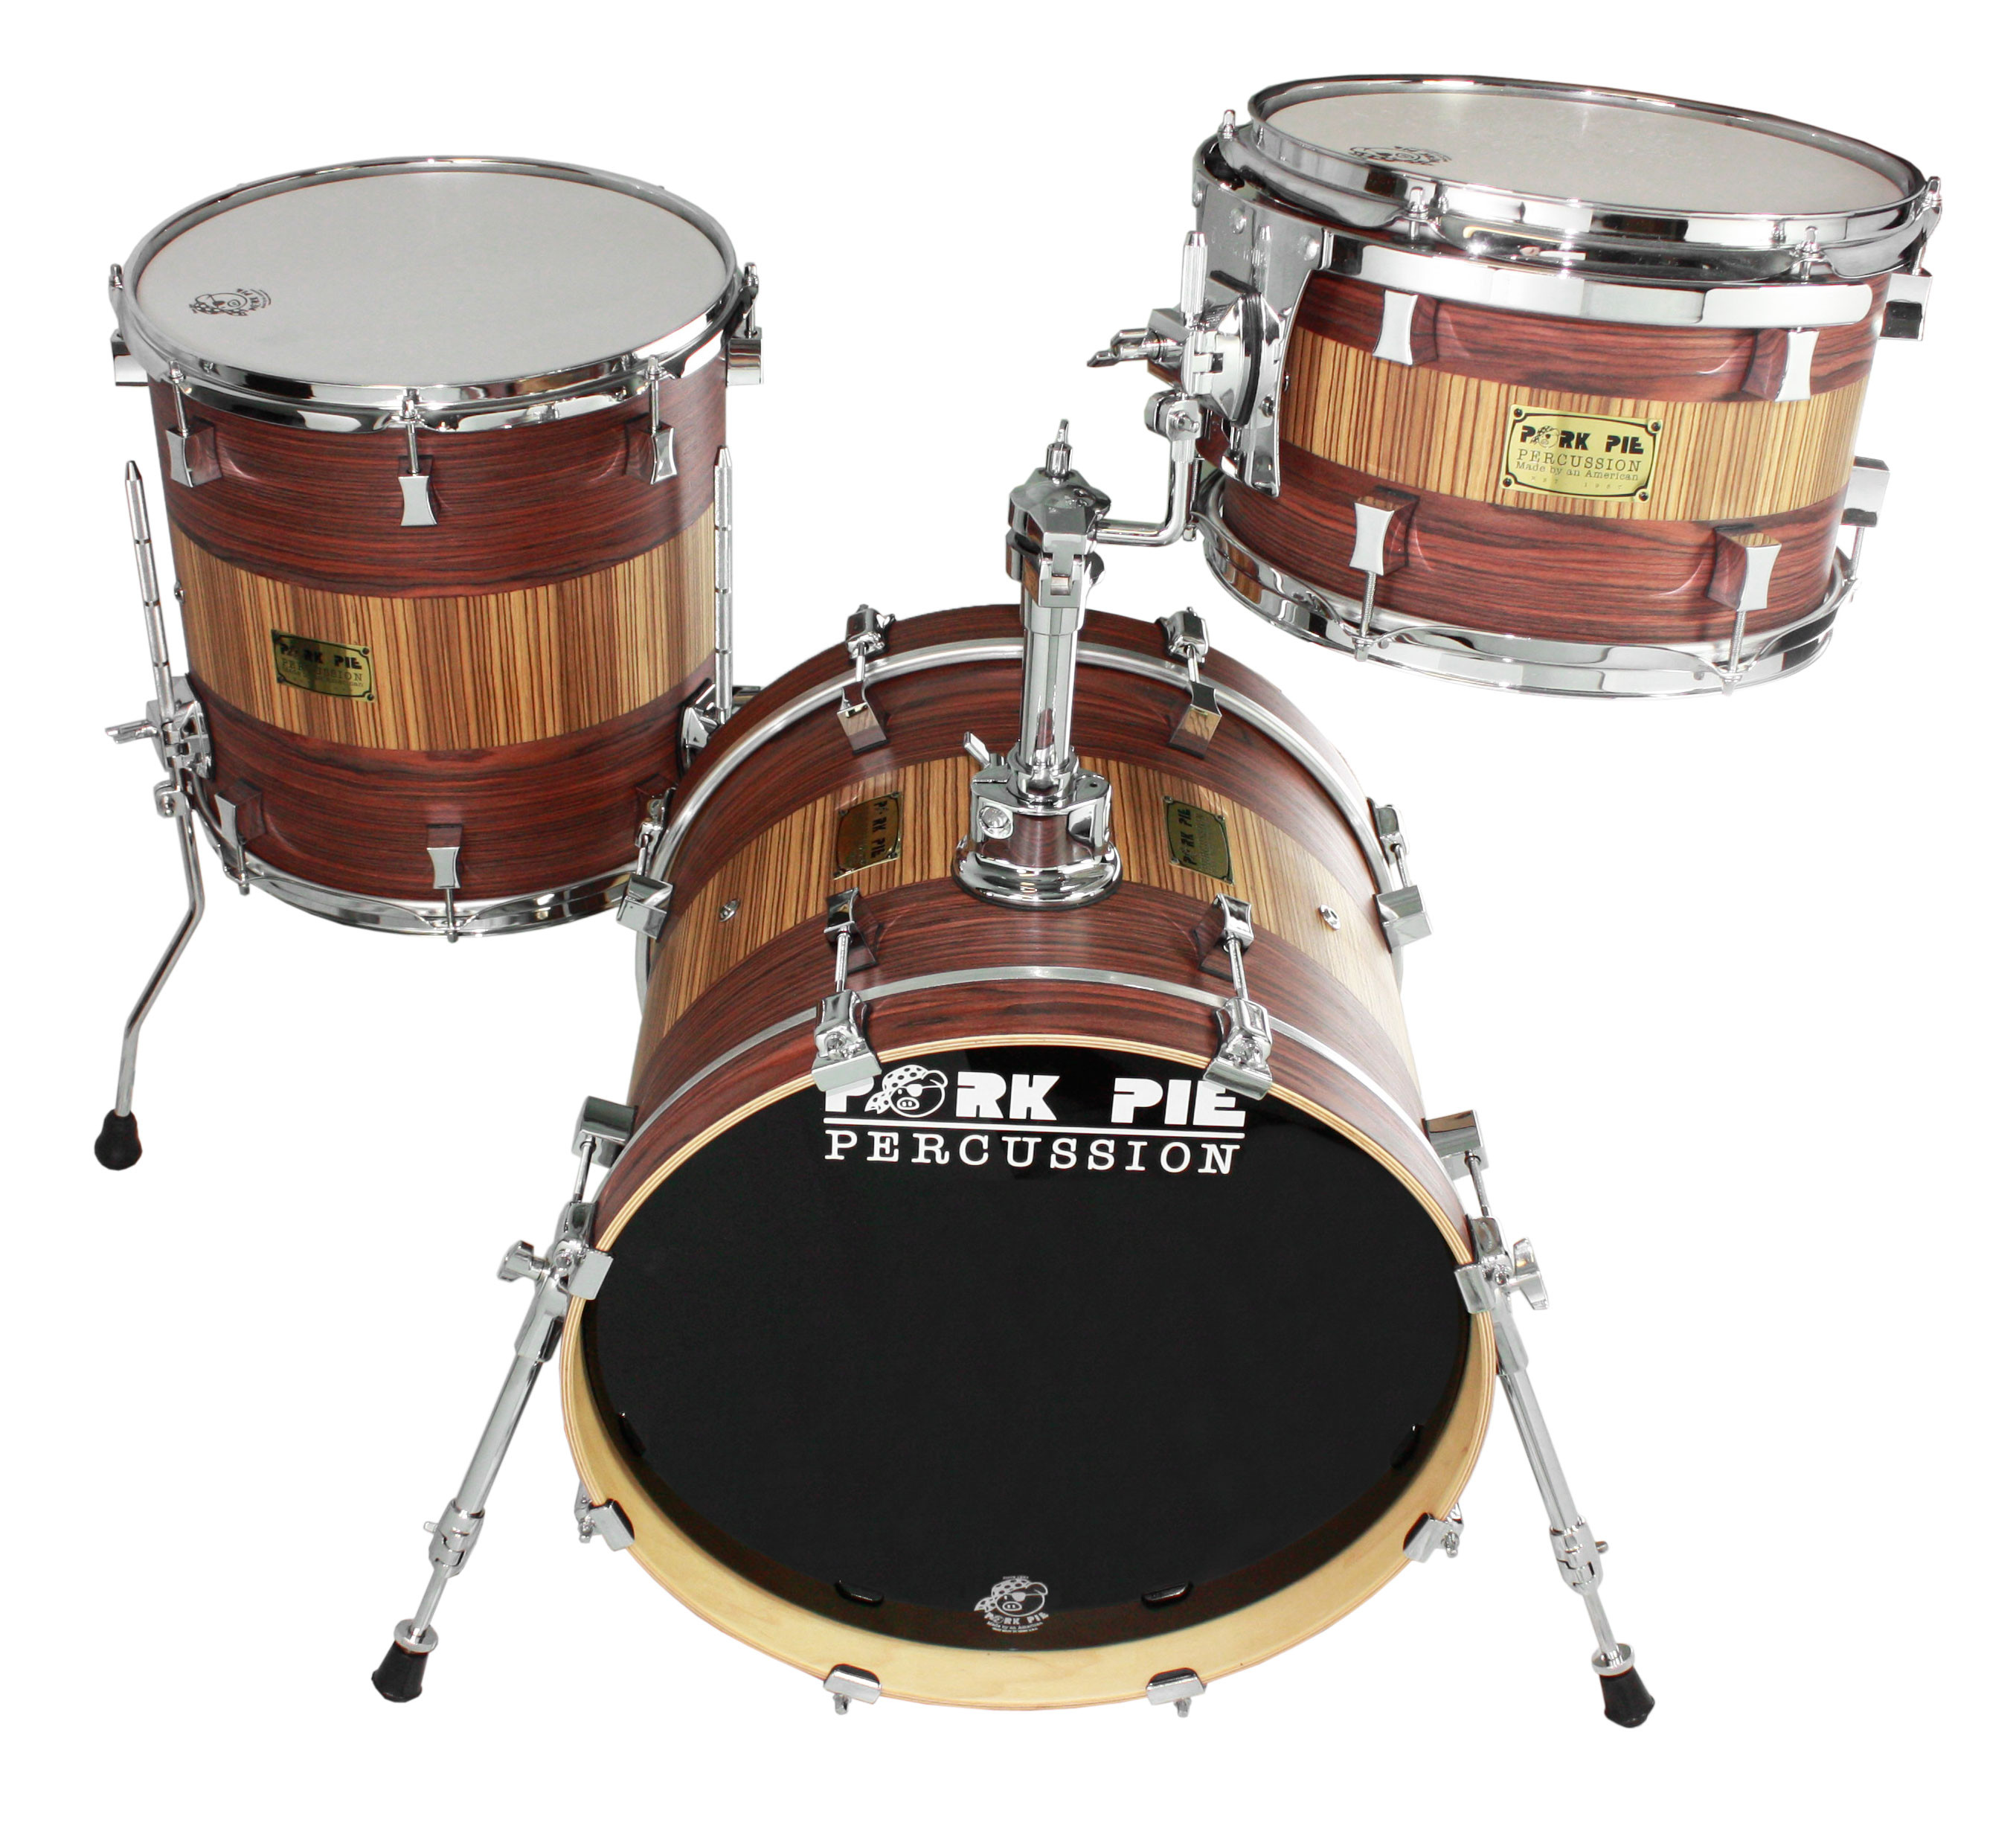 Pork Pie Drums  Pork Pie Percussion USA Bop 3 Piece Drum Set Shell Pack